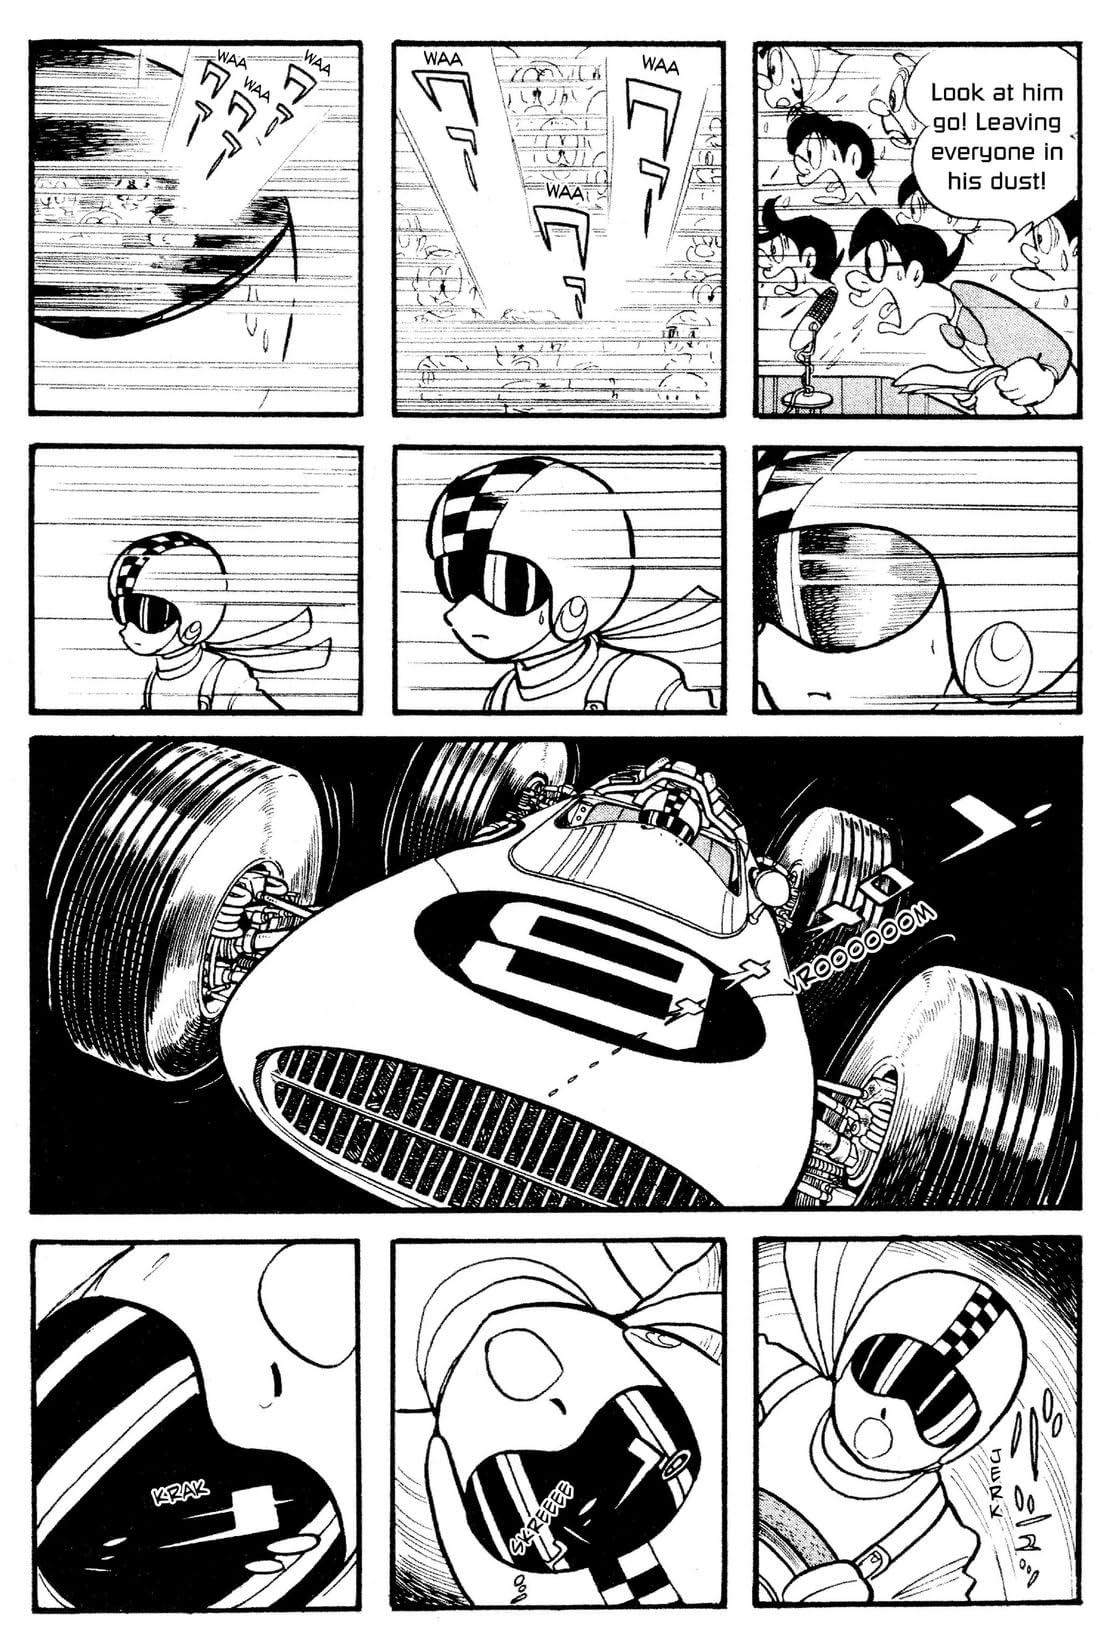 Cyborg 009 Vol. 8: Preview